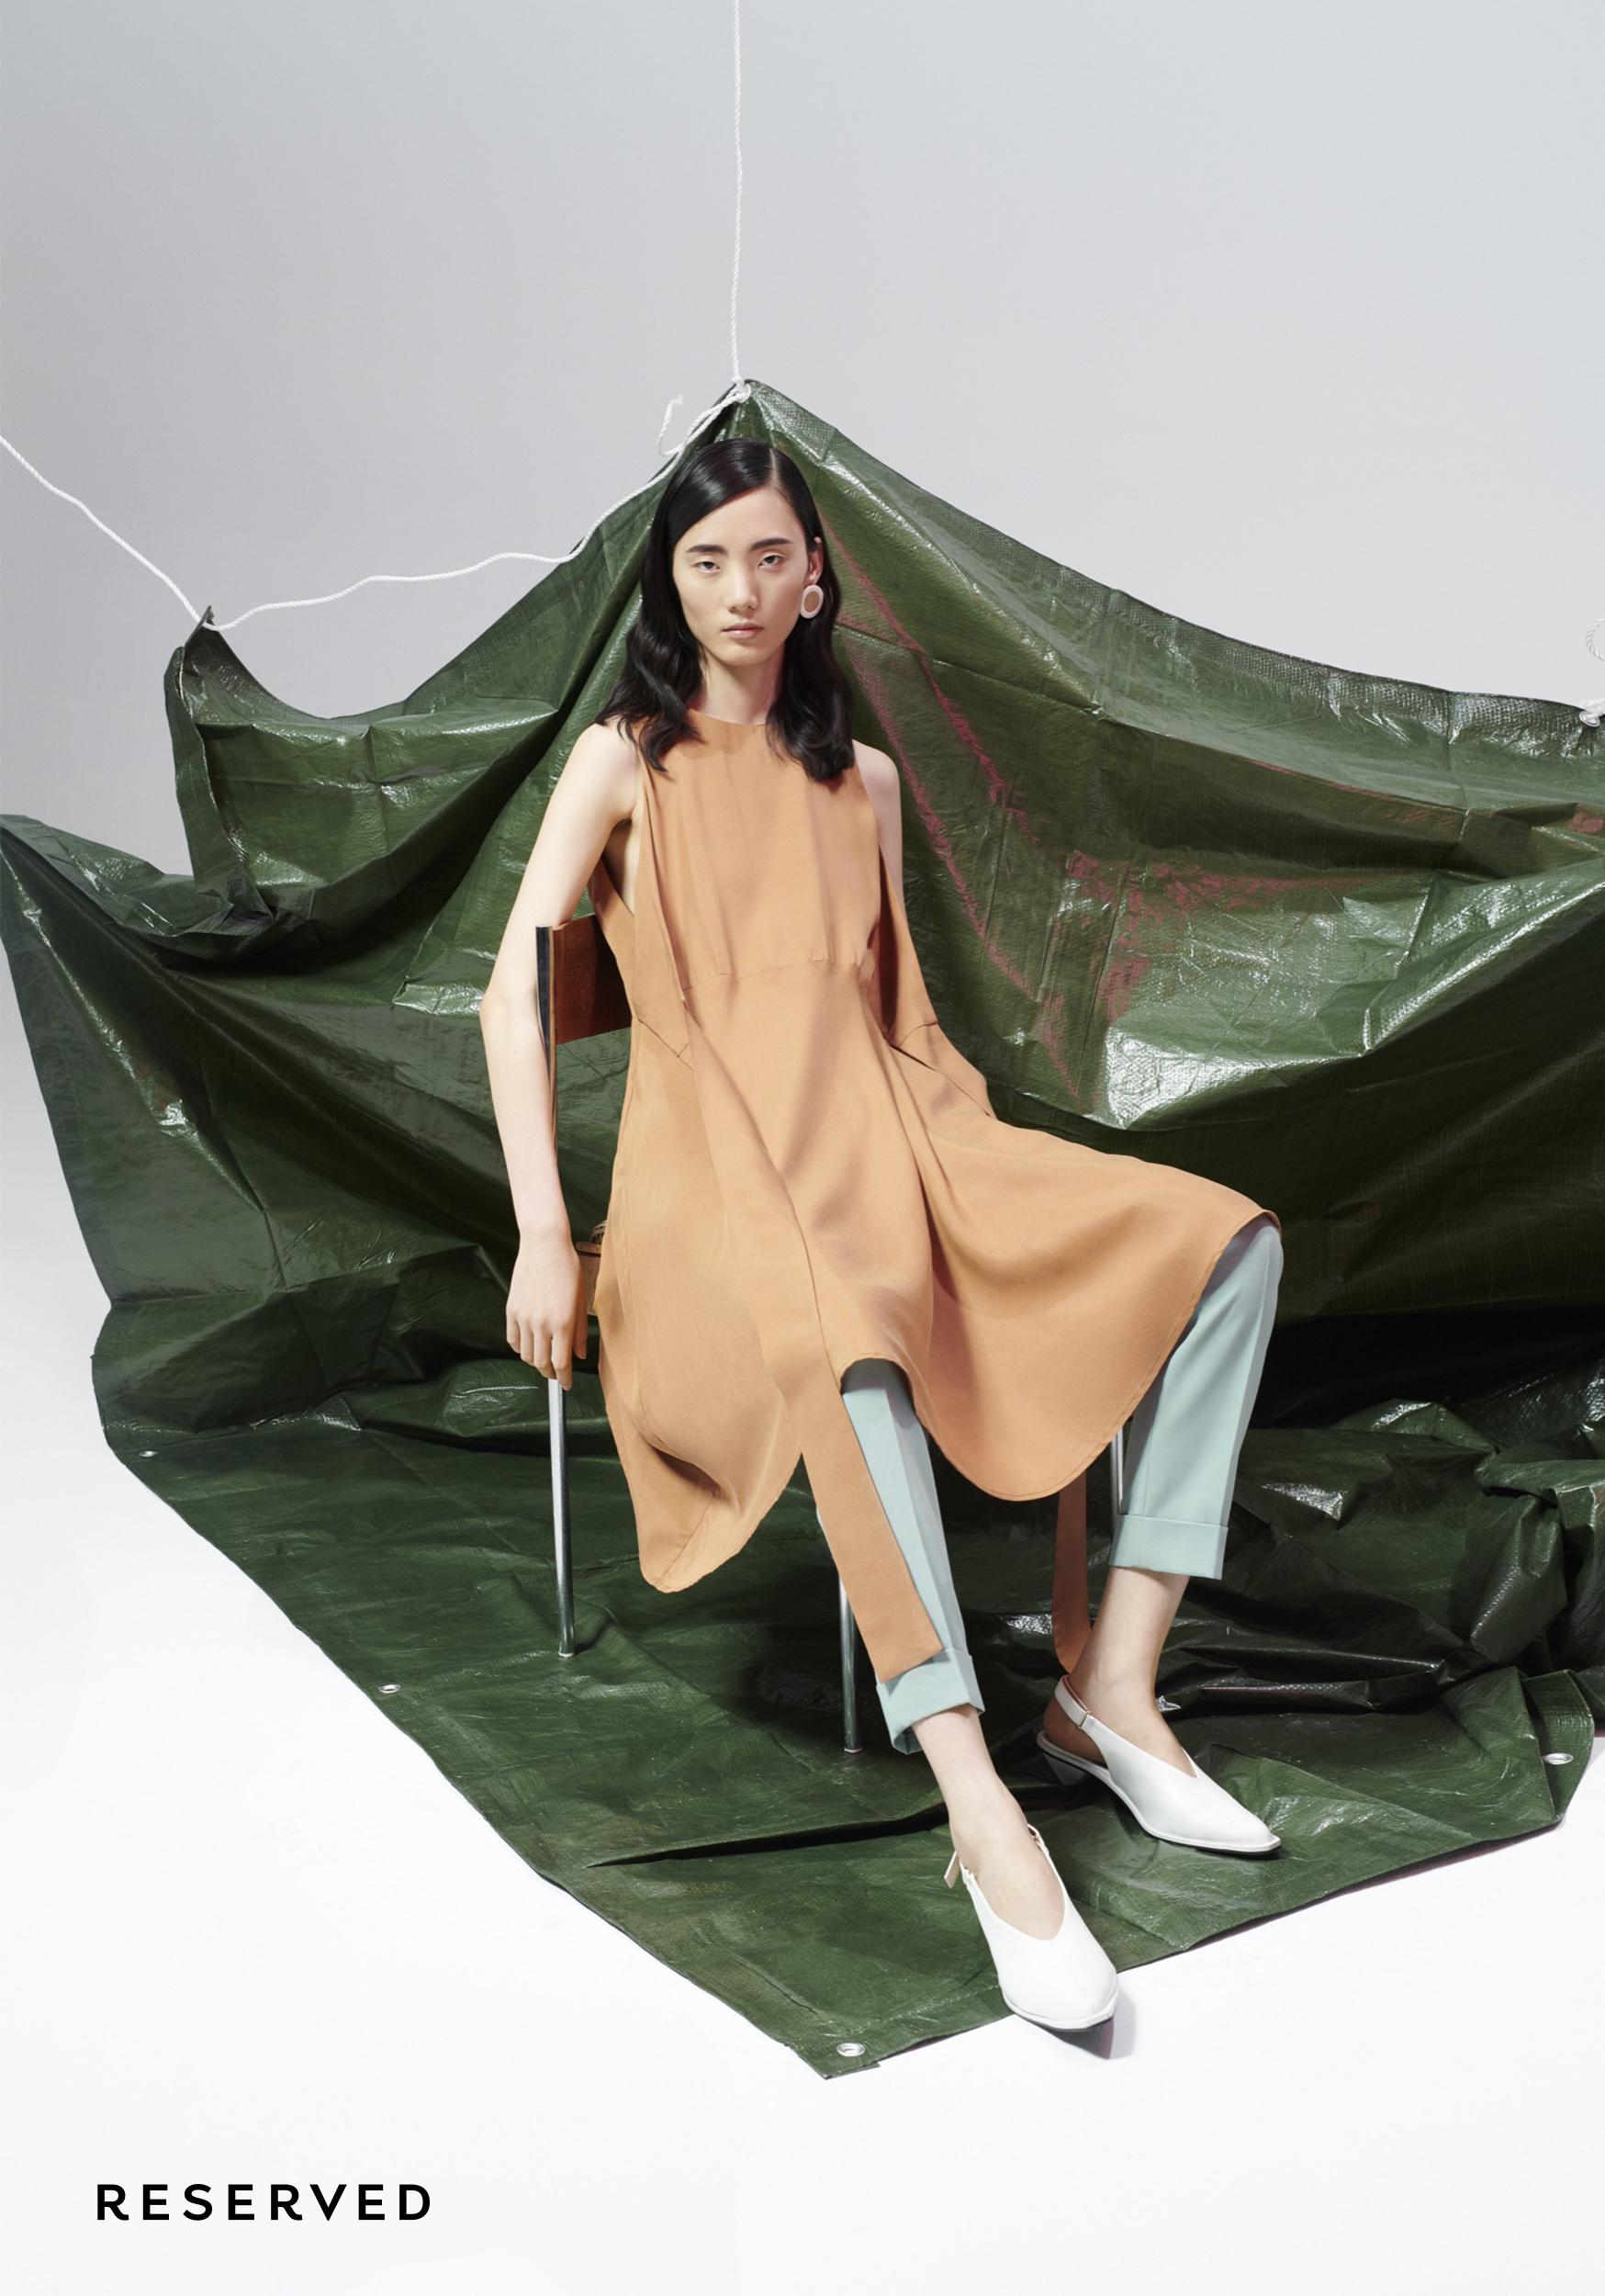 17c08dbfe9 Nowa kolekcja Reserved Premium – wiosna-lato 2019 - Elle.pl - trendy wiosna  lato 2019  moda